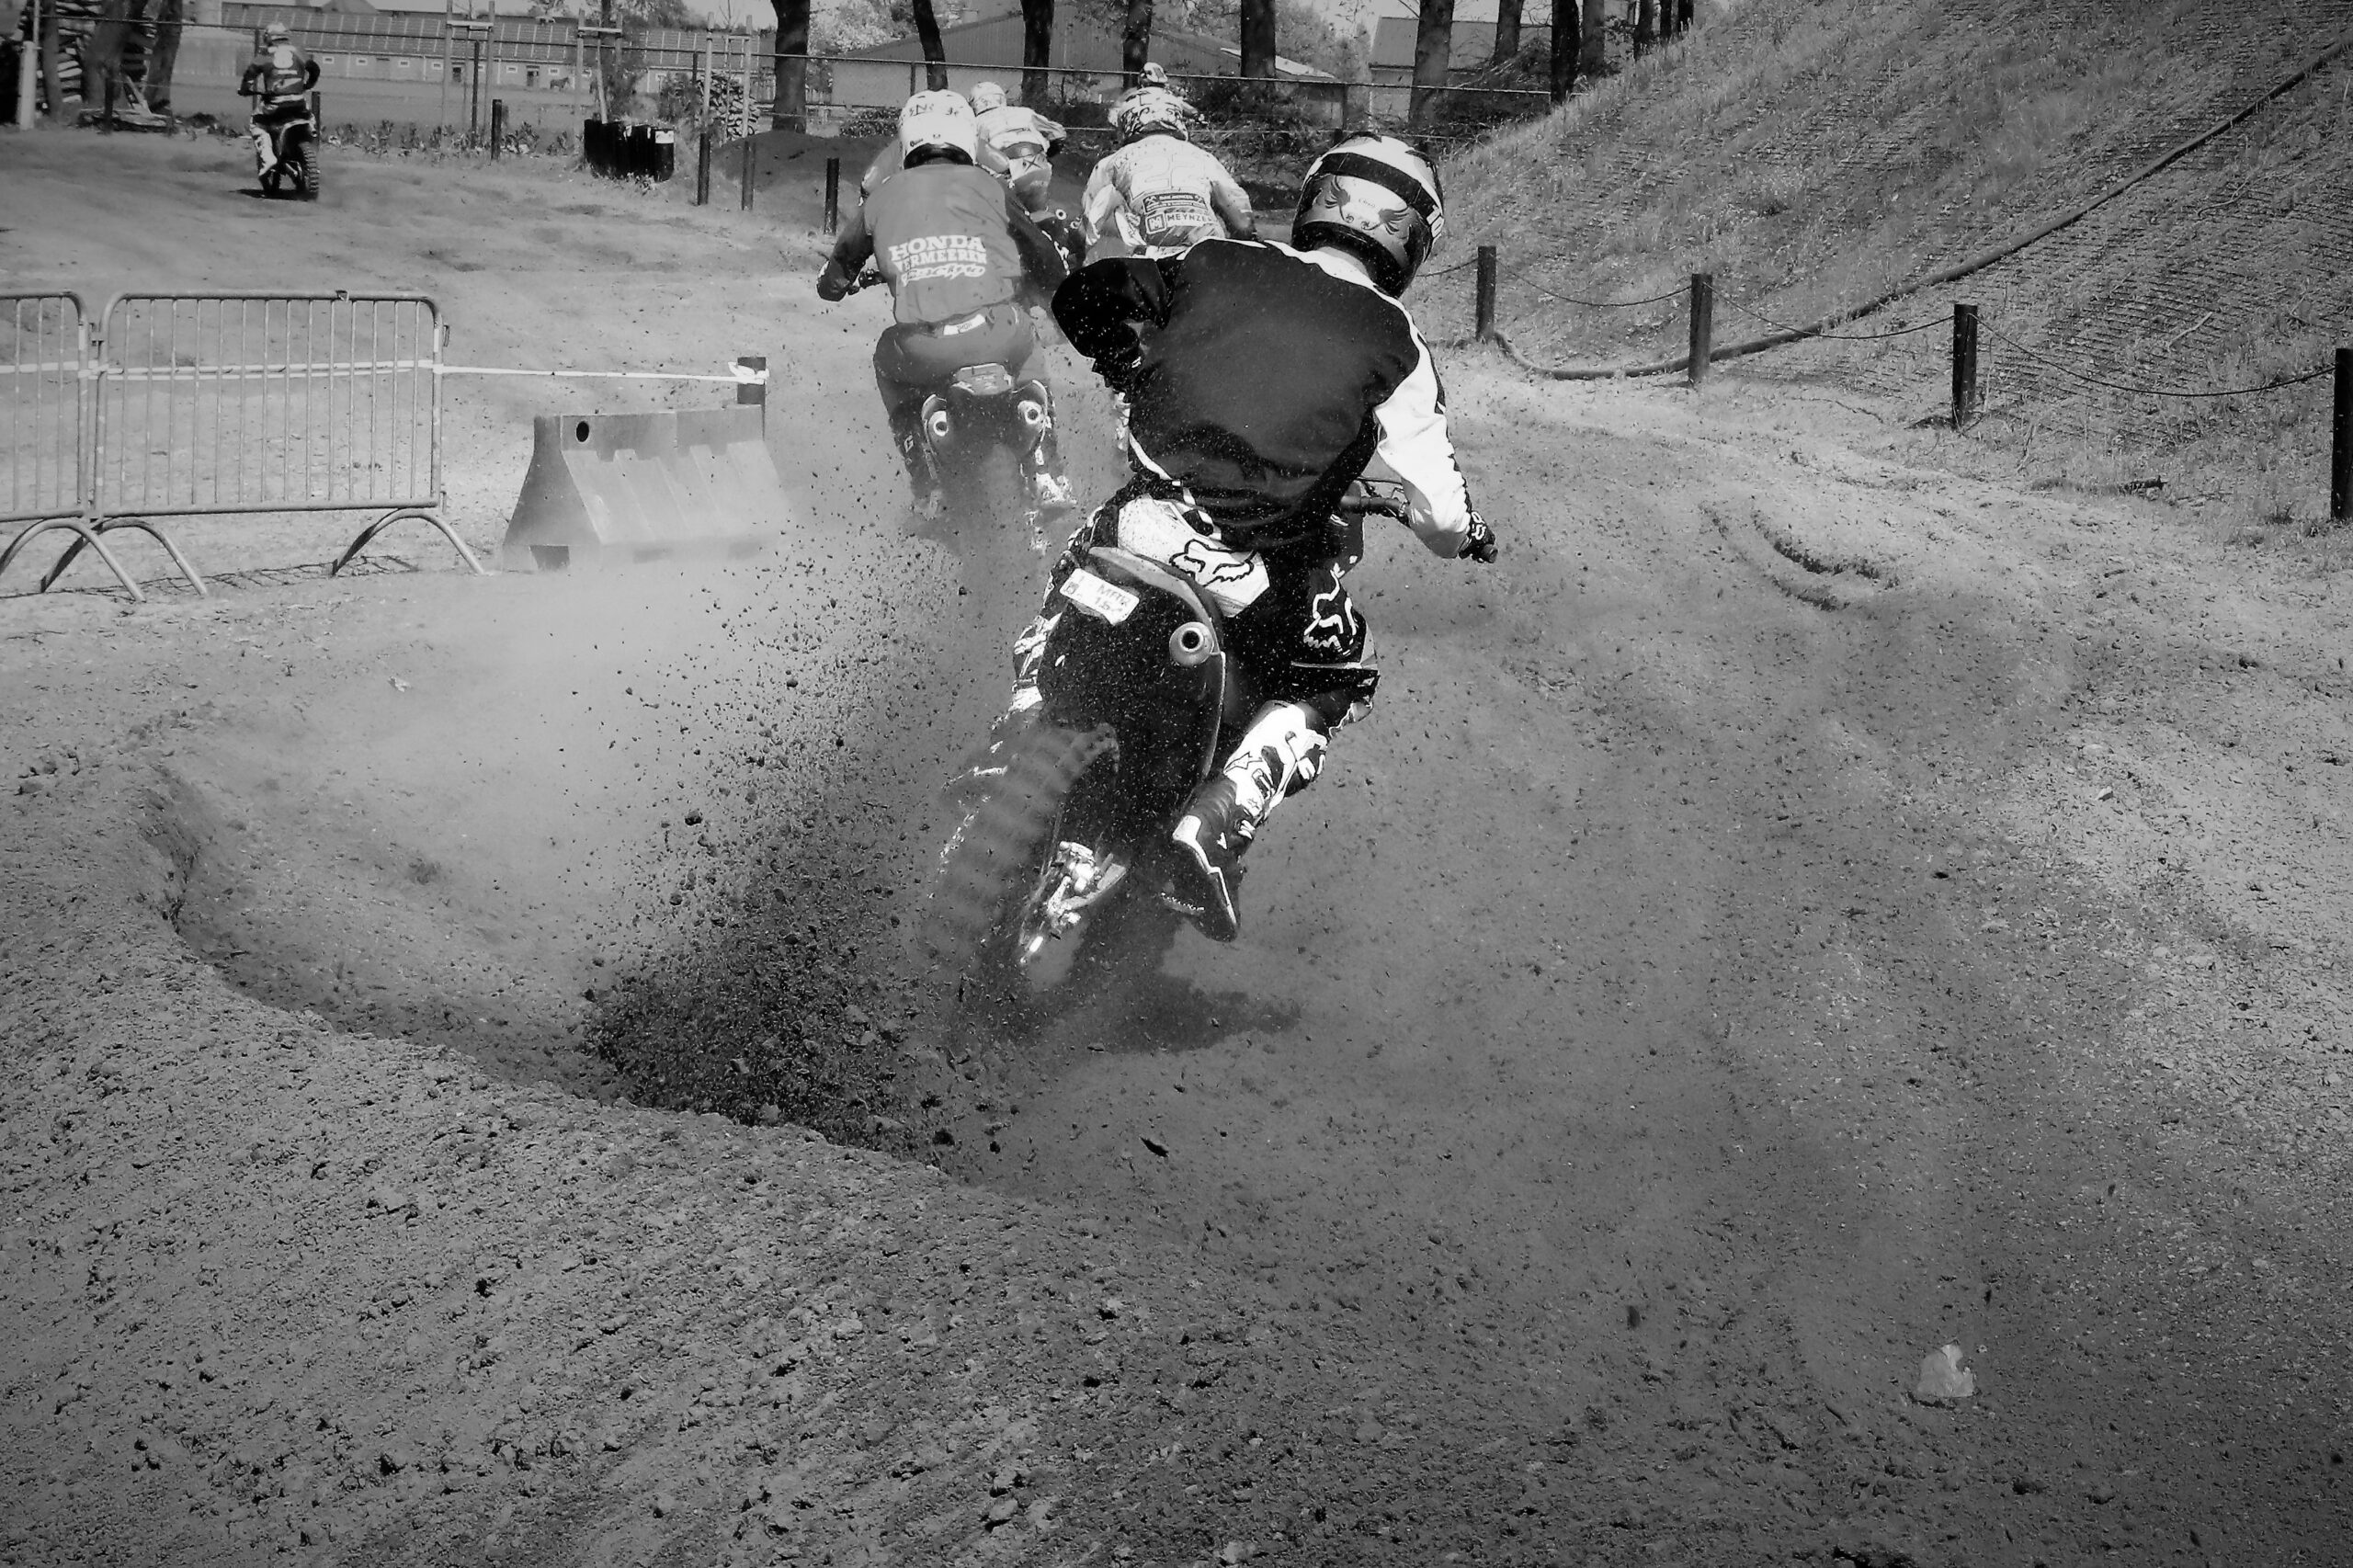 crosser rides